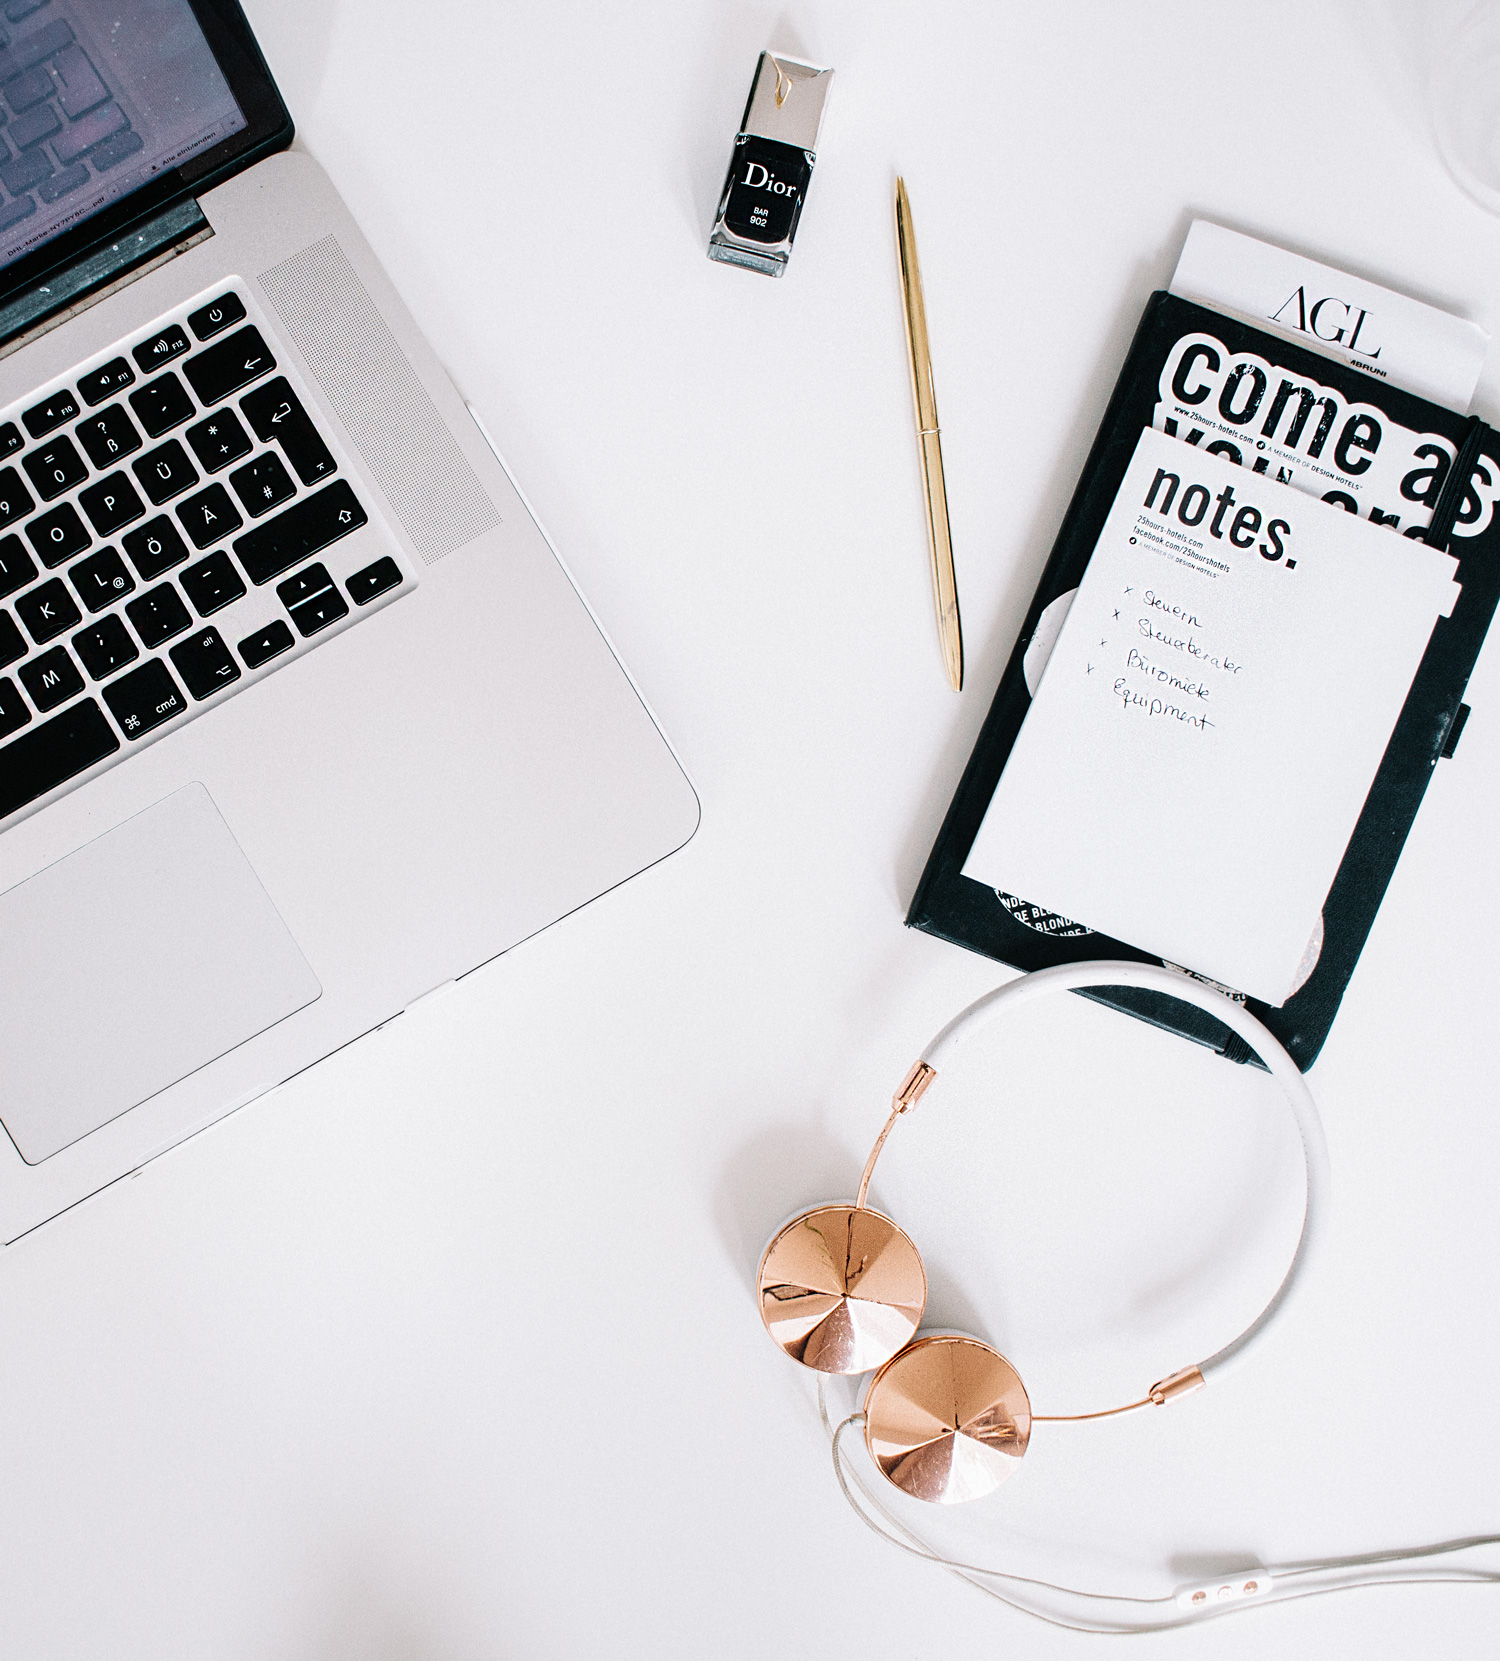 blogger-work-1